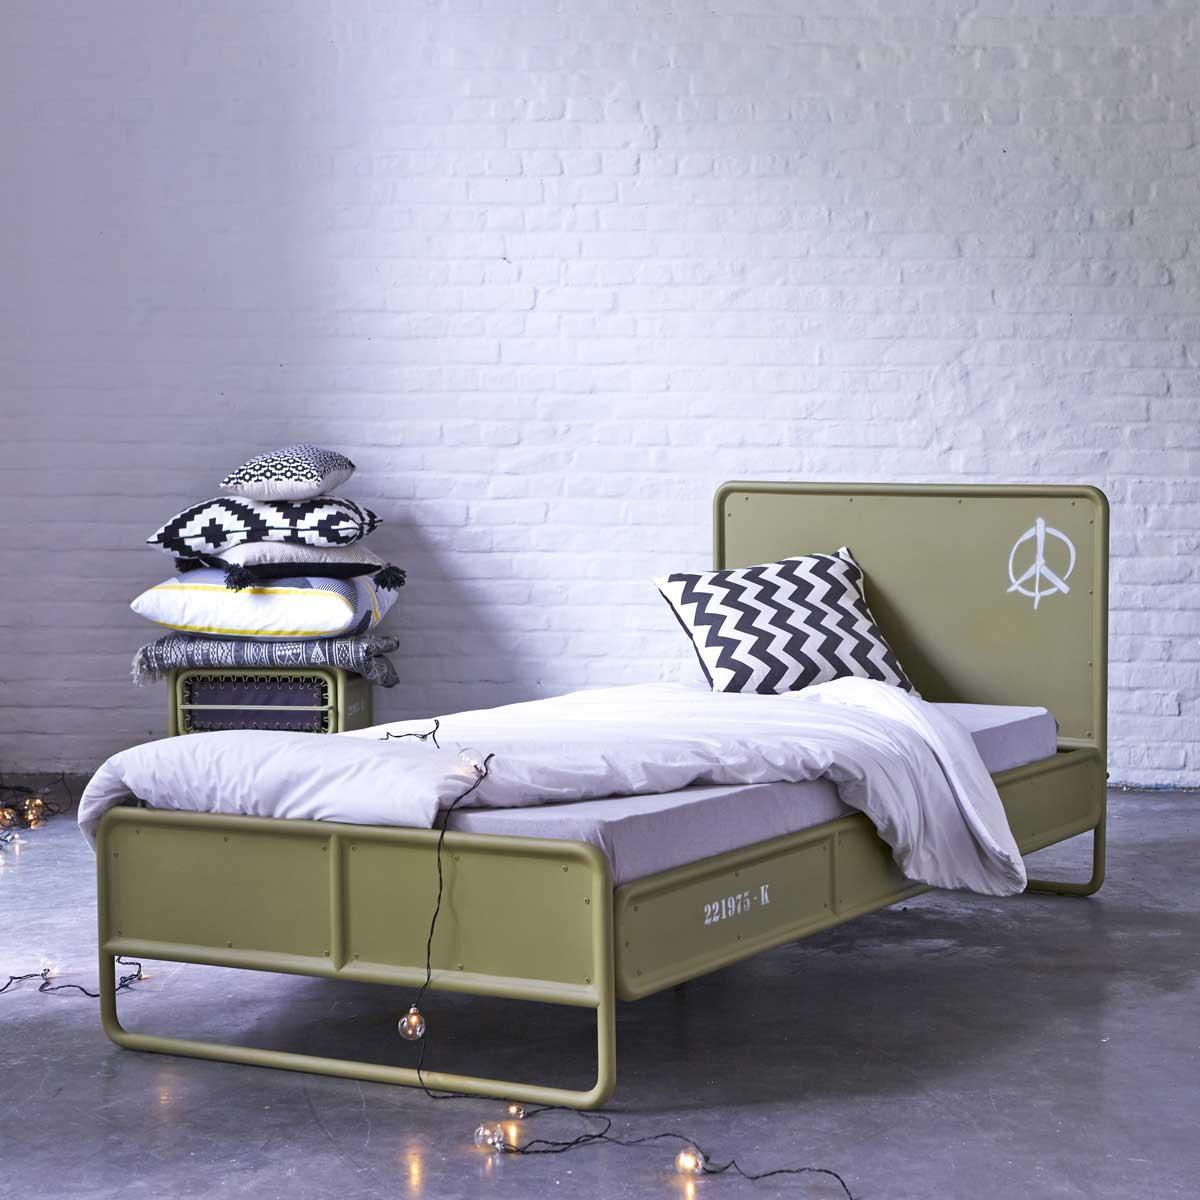 lit pour enfant en m tal kaki. Black Bedroom Furniture Sets. Home Design Ideas